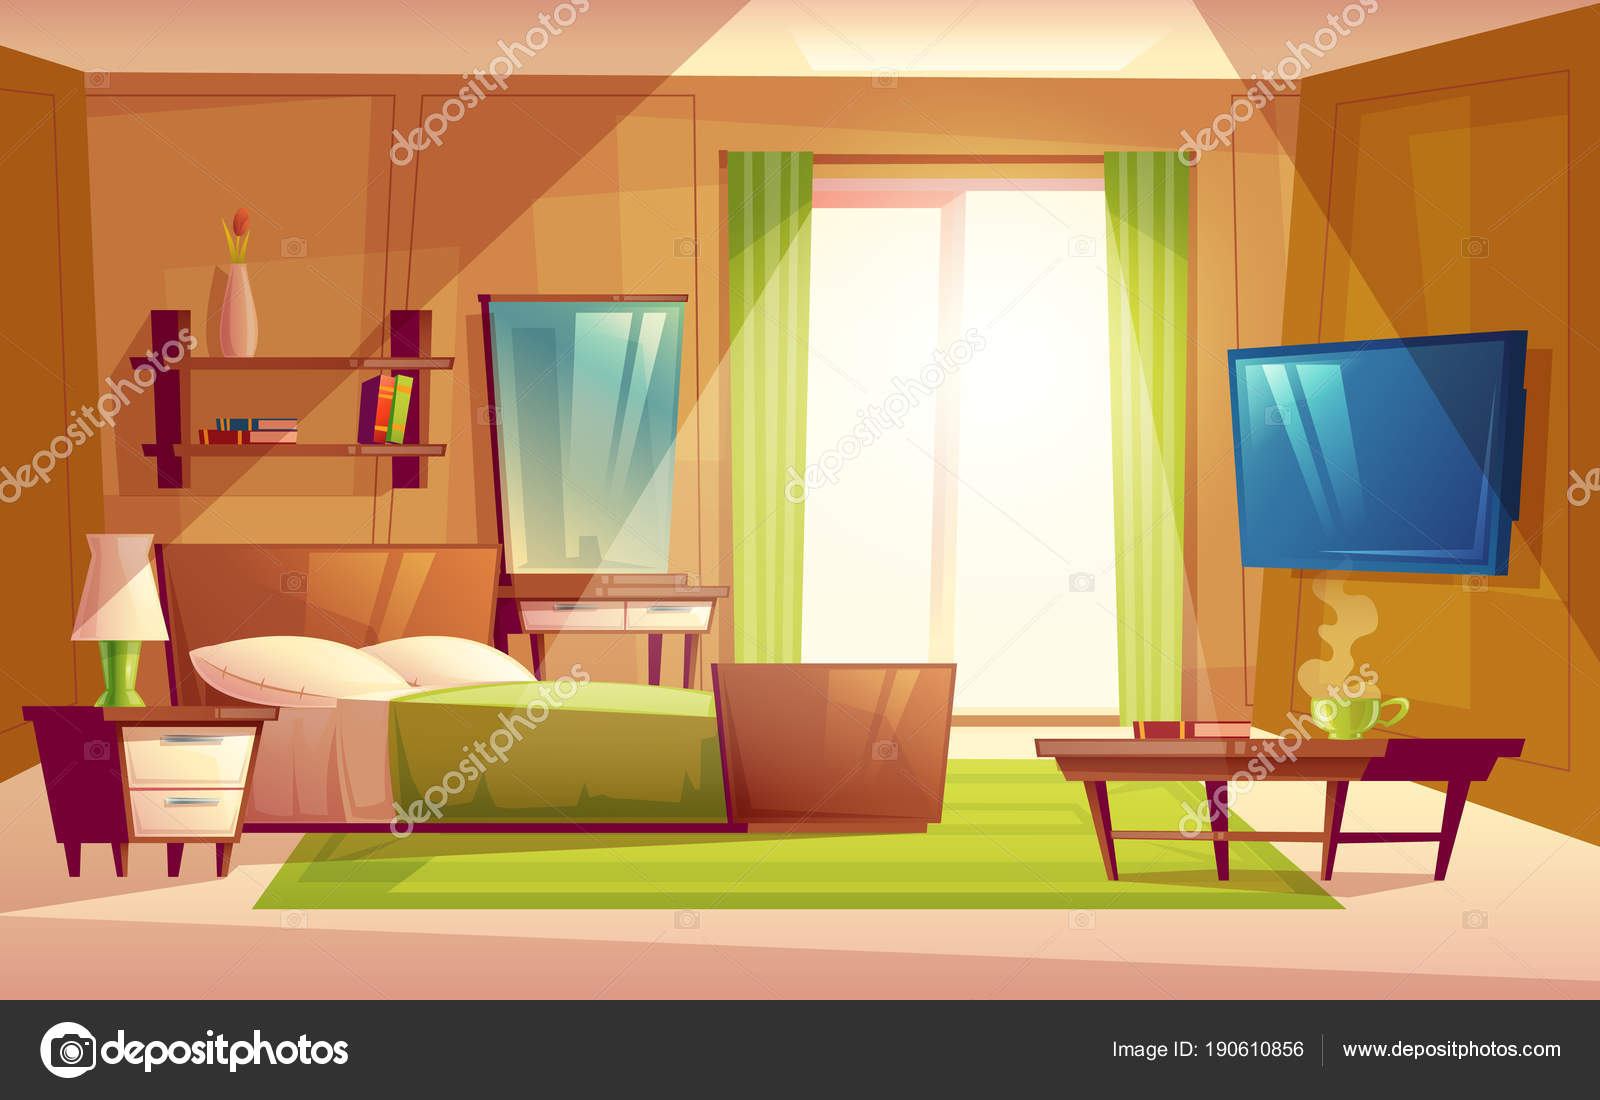 Slaapkamer In Woonkamer : Vector cartoon interieur van gezellige moderne slaapkamer